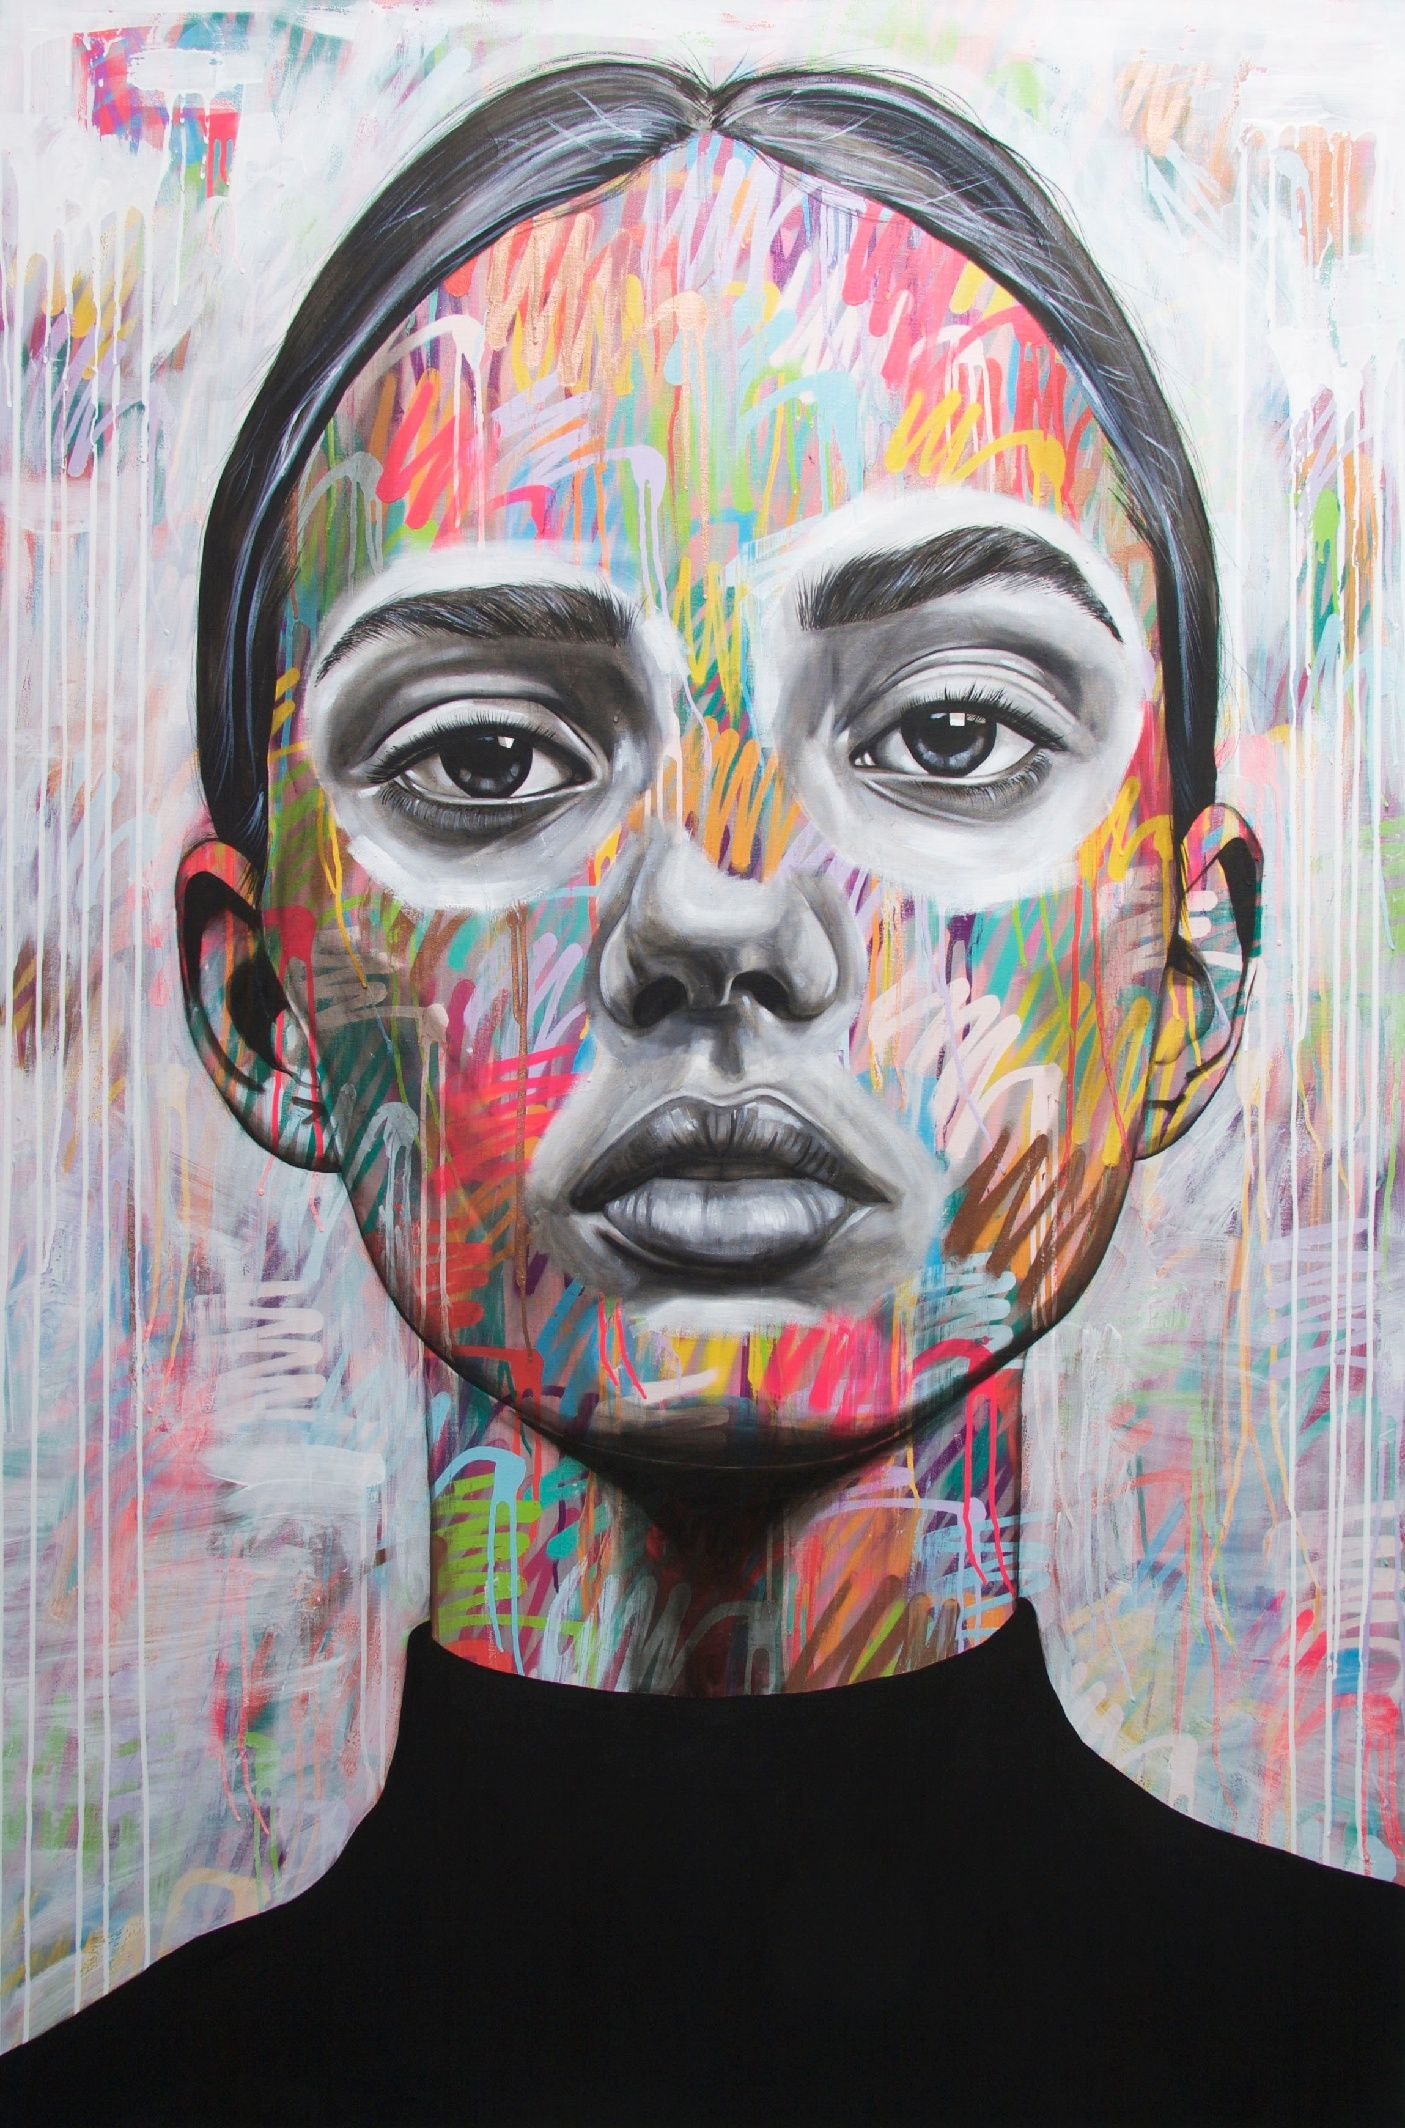 By Ant Carver Graffiti Street Art In 2019 Gcse Art Sketchbook